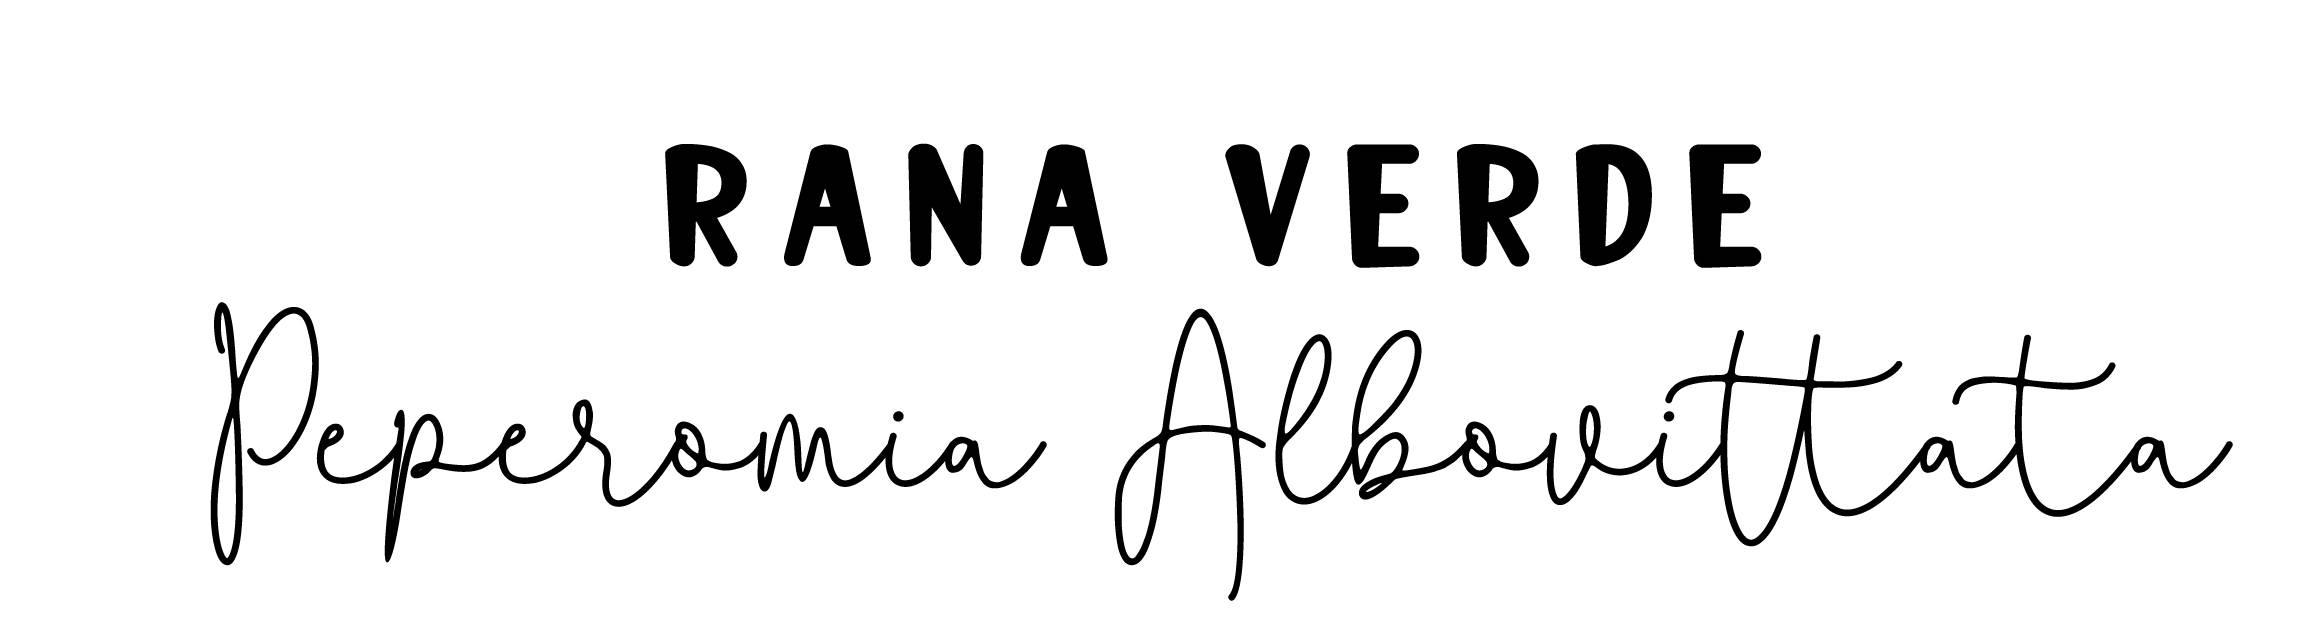 Rana Verde: Peperomia Albovittata Rana Verde